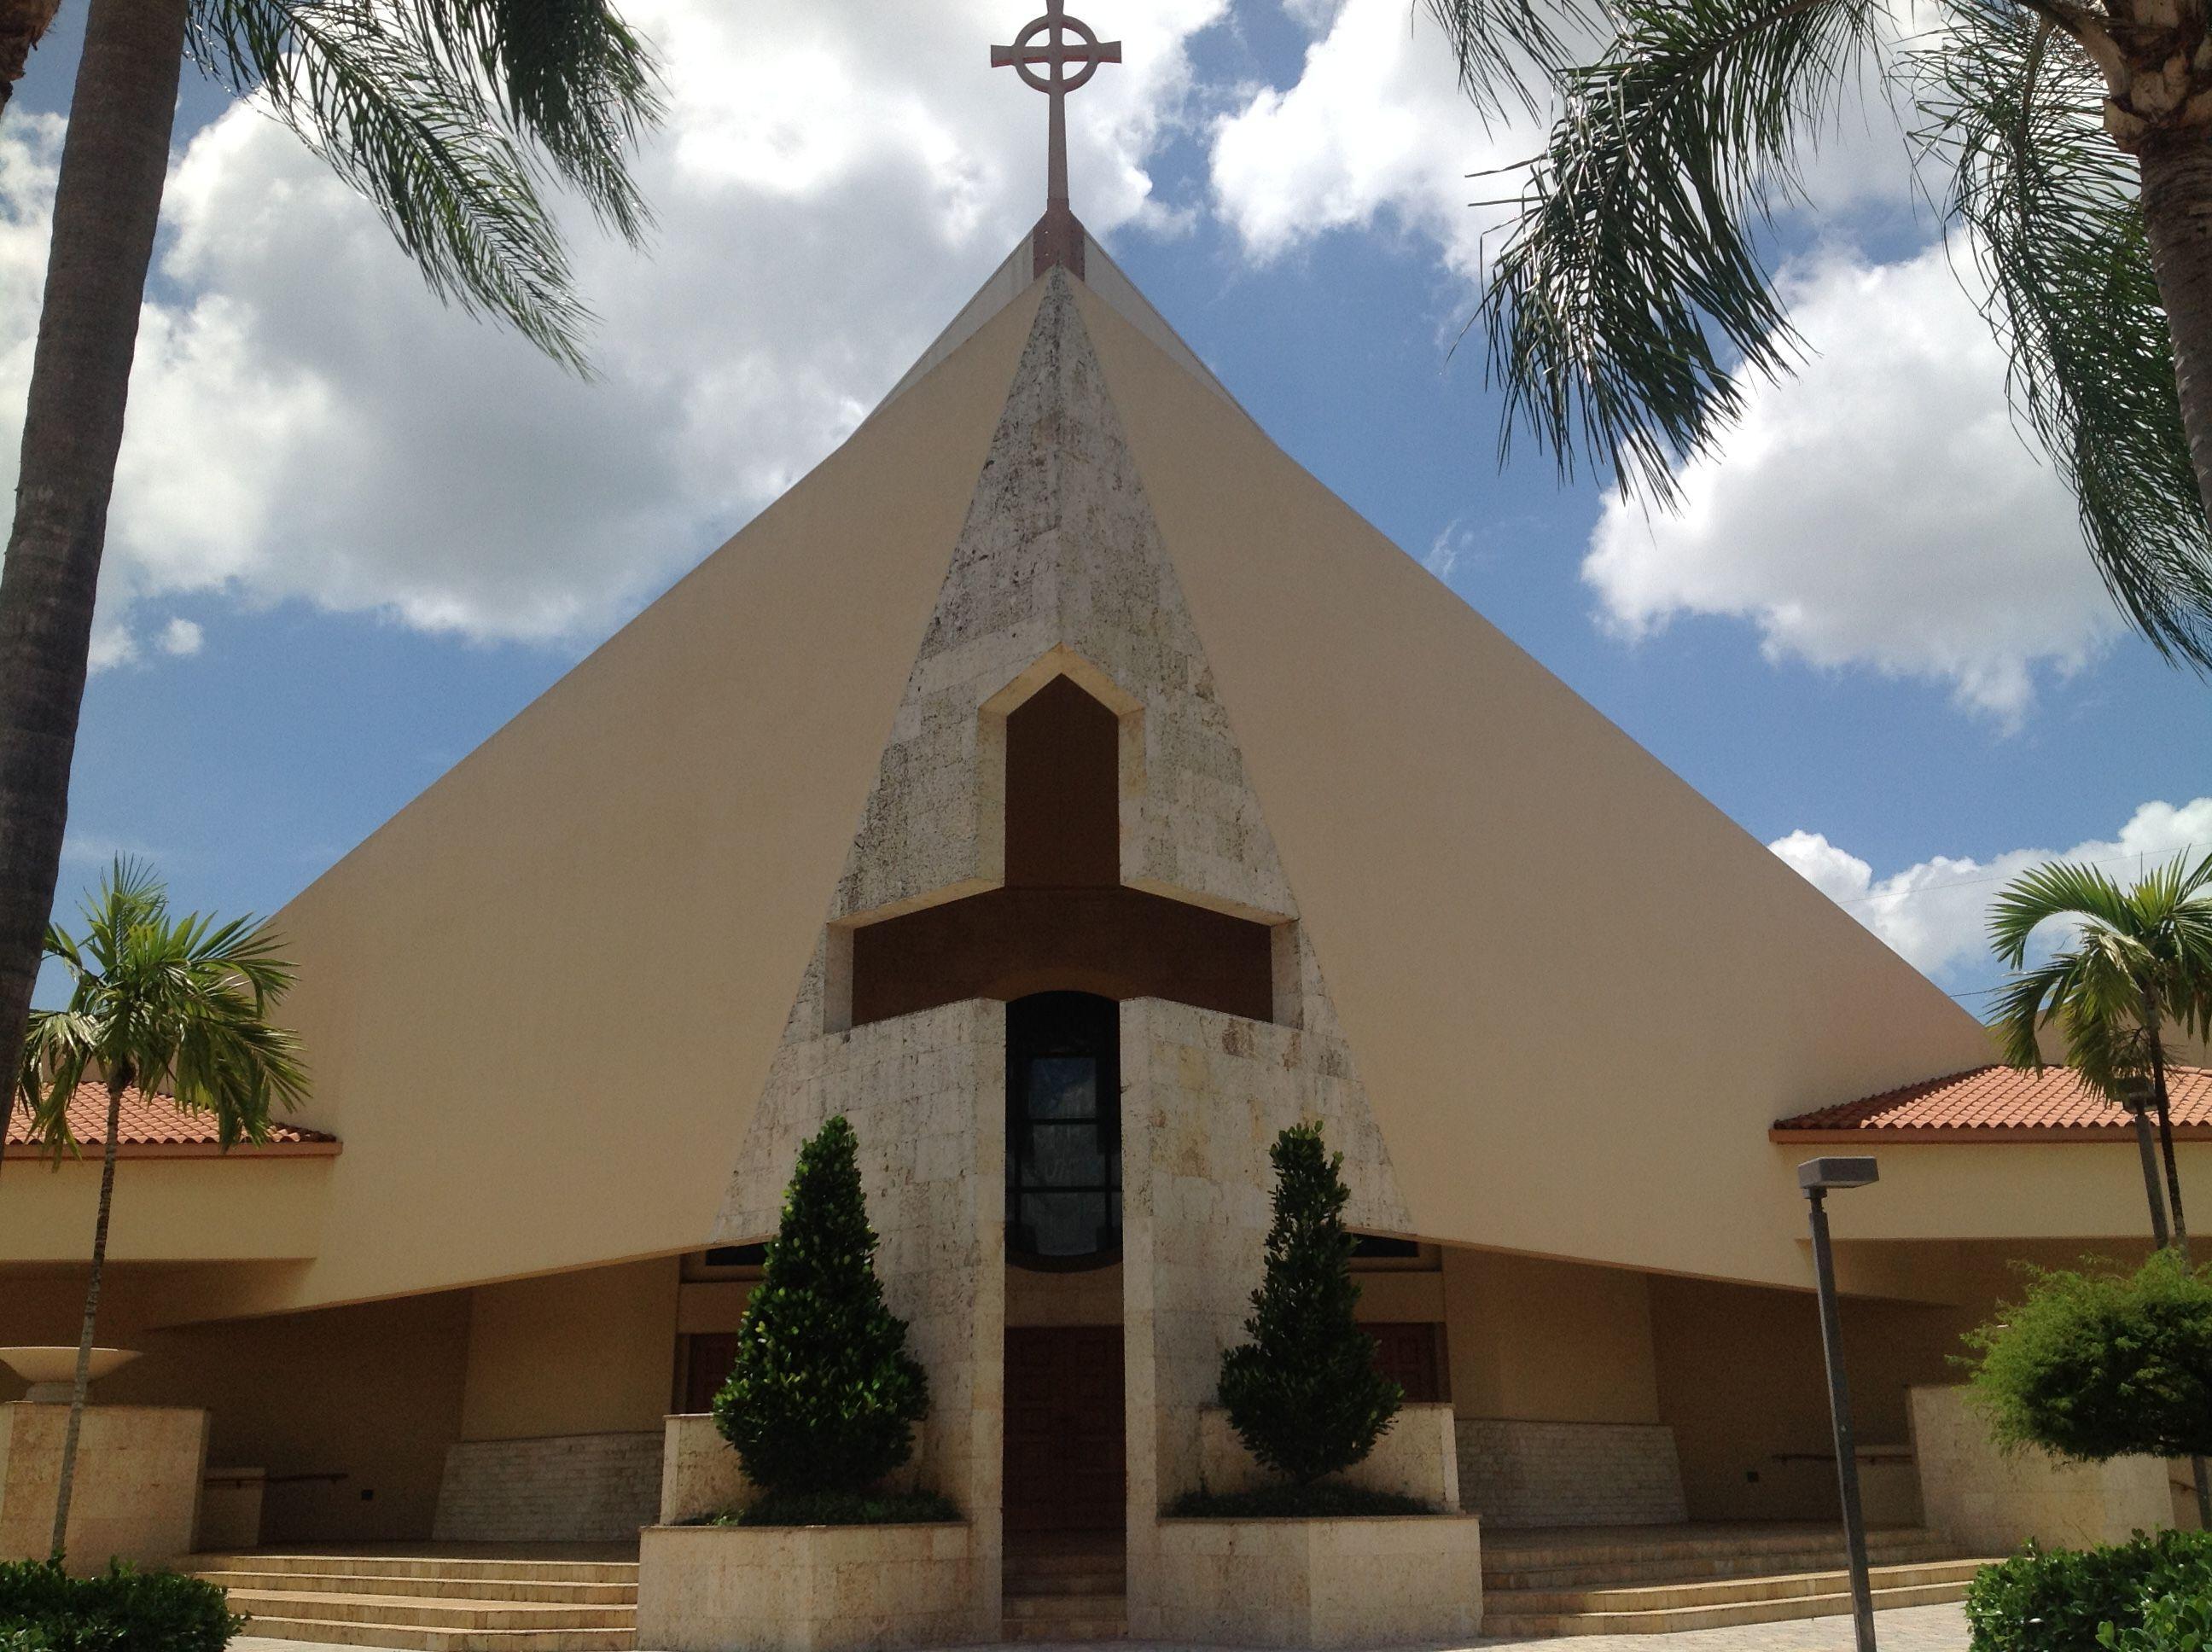 St. Bonaventure Catholic School